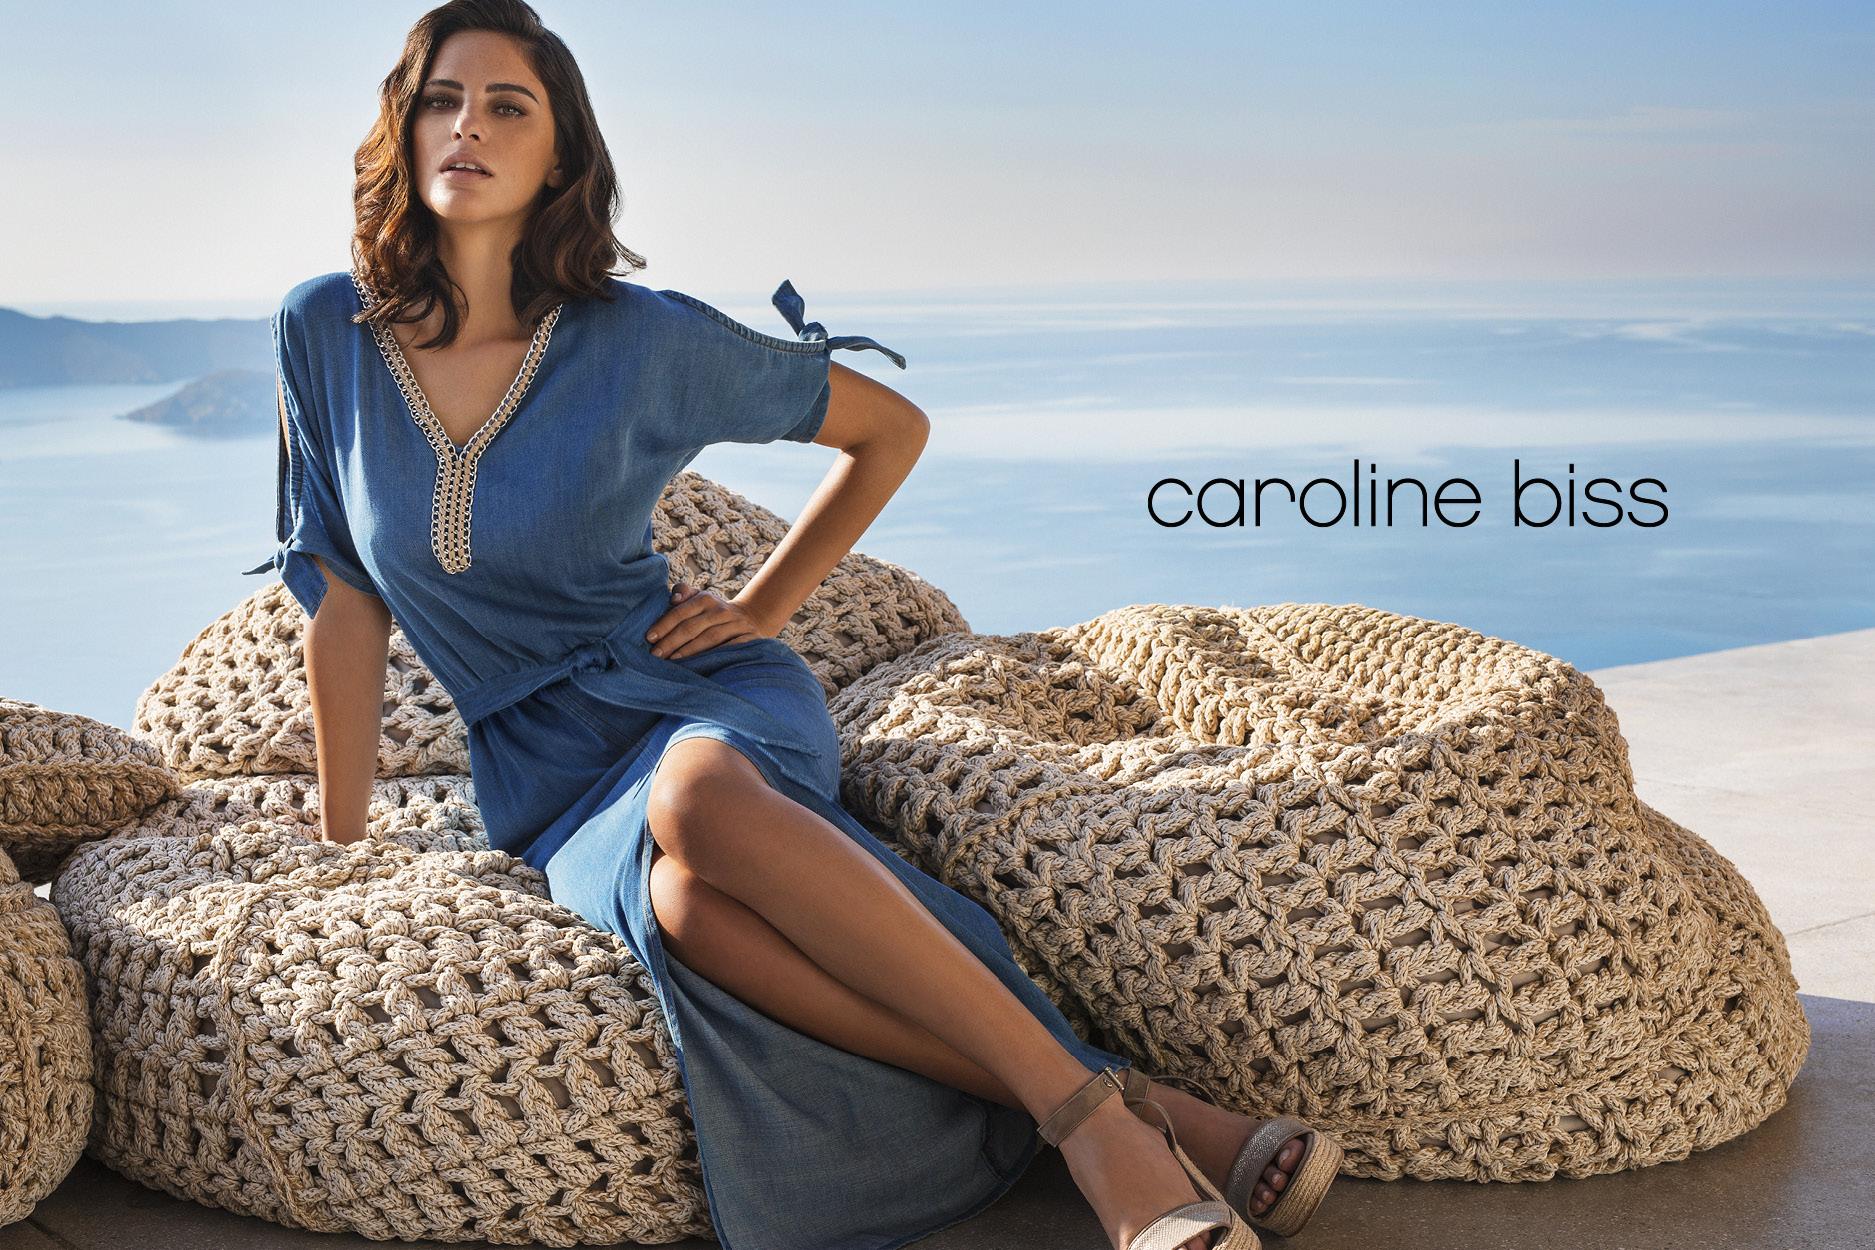 CarolineBiss_alejandra2_imageboulevard